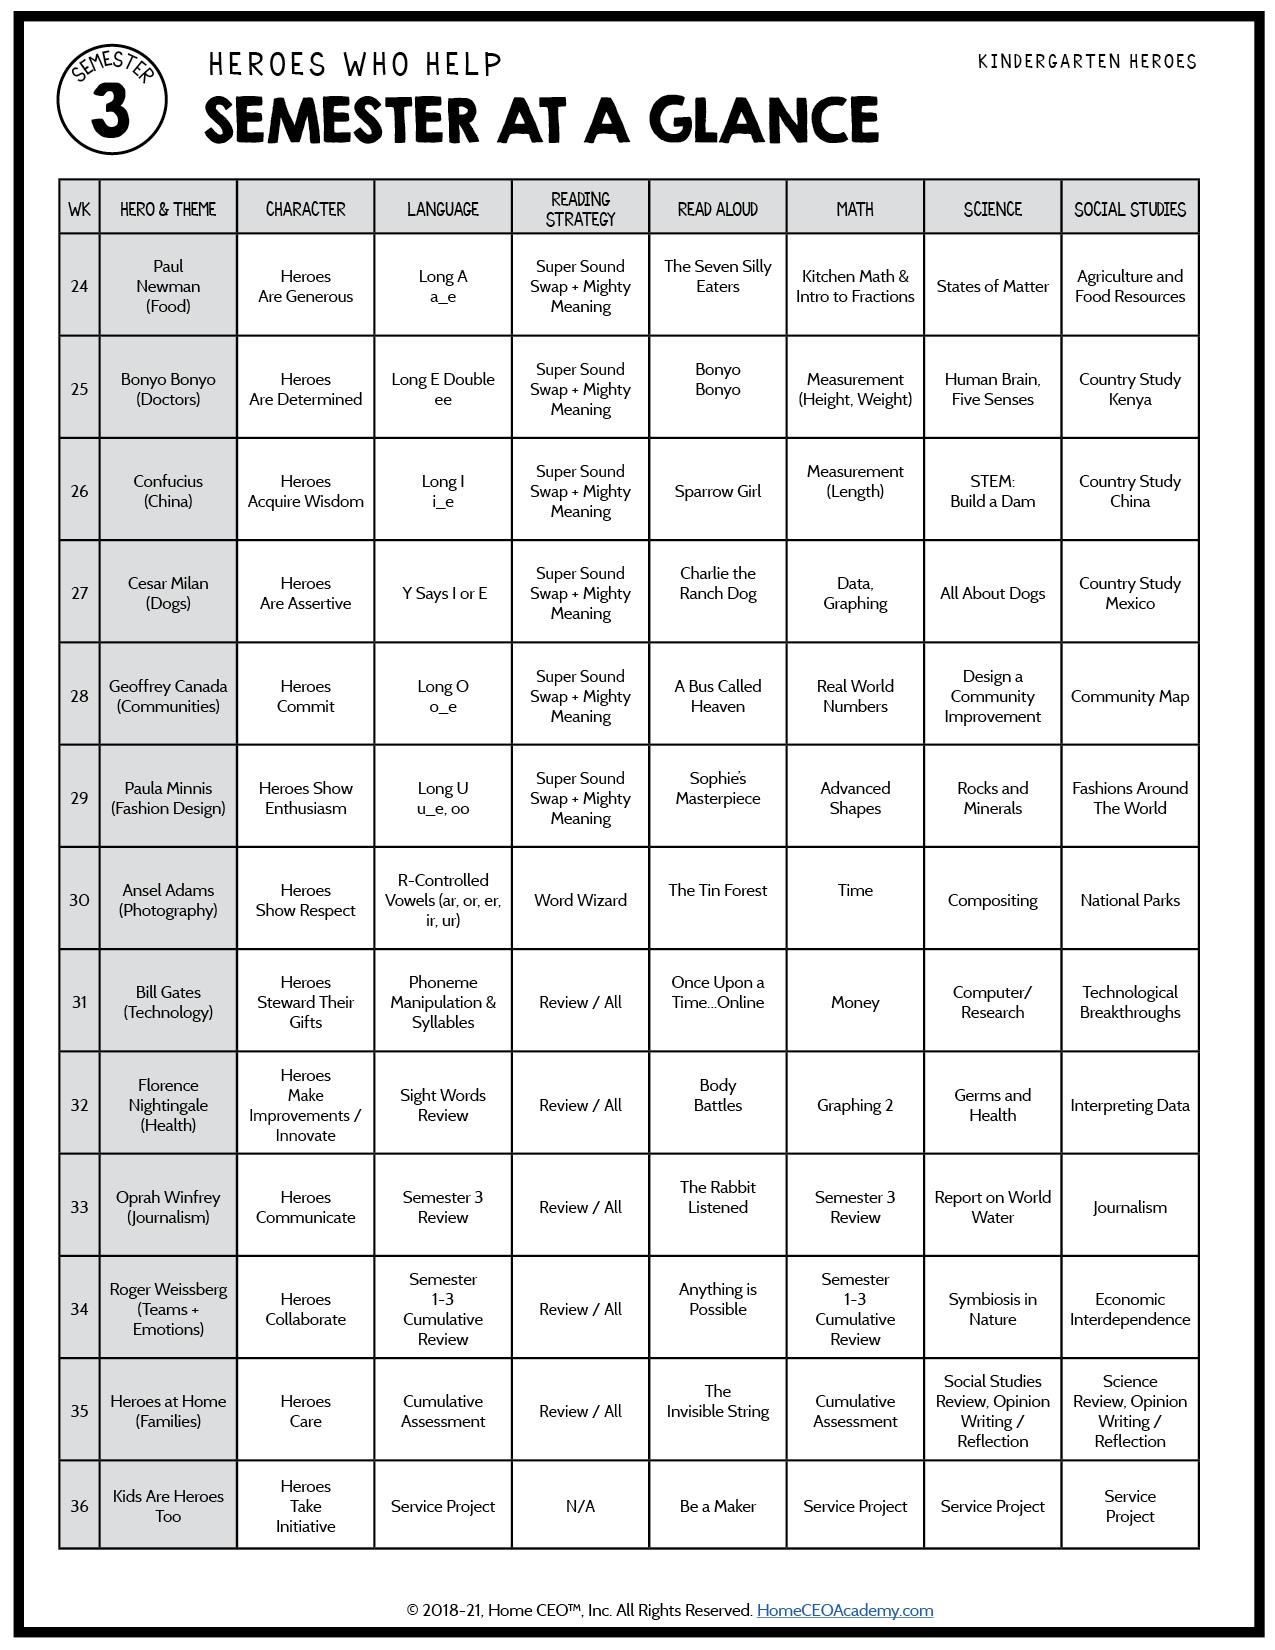 Kindergarten Heroes Semester 3 Curriculum Map